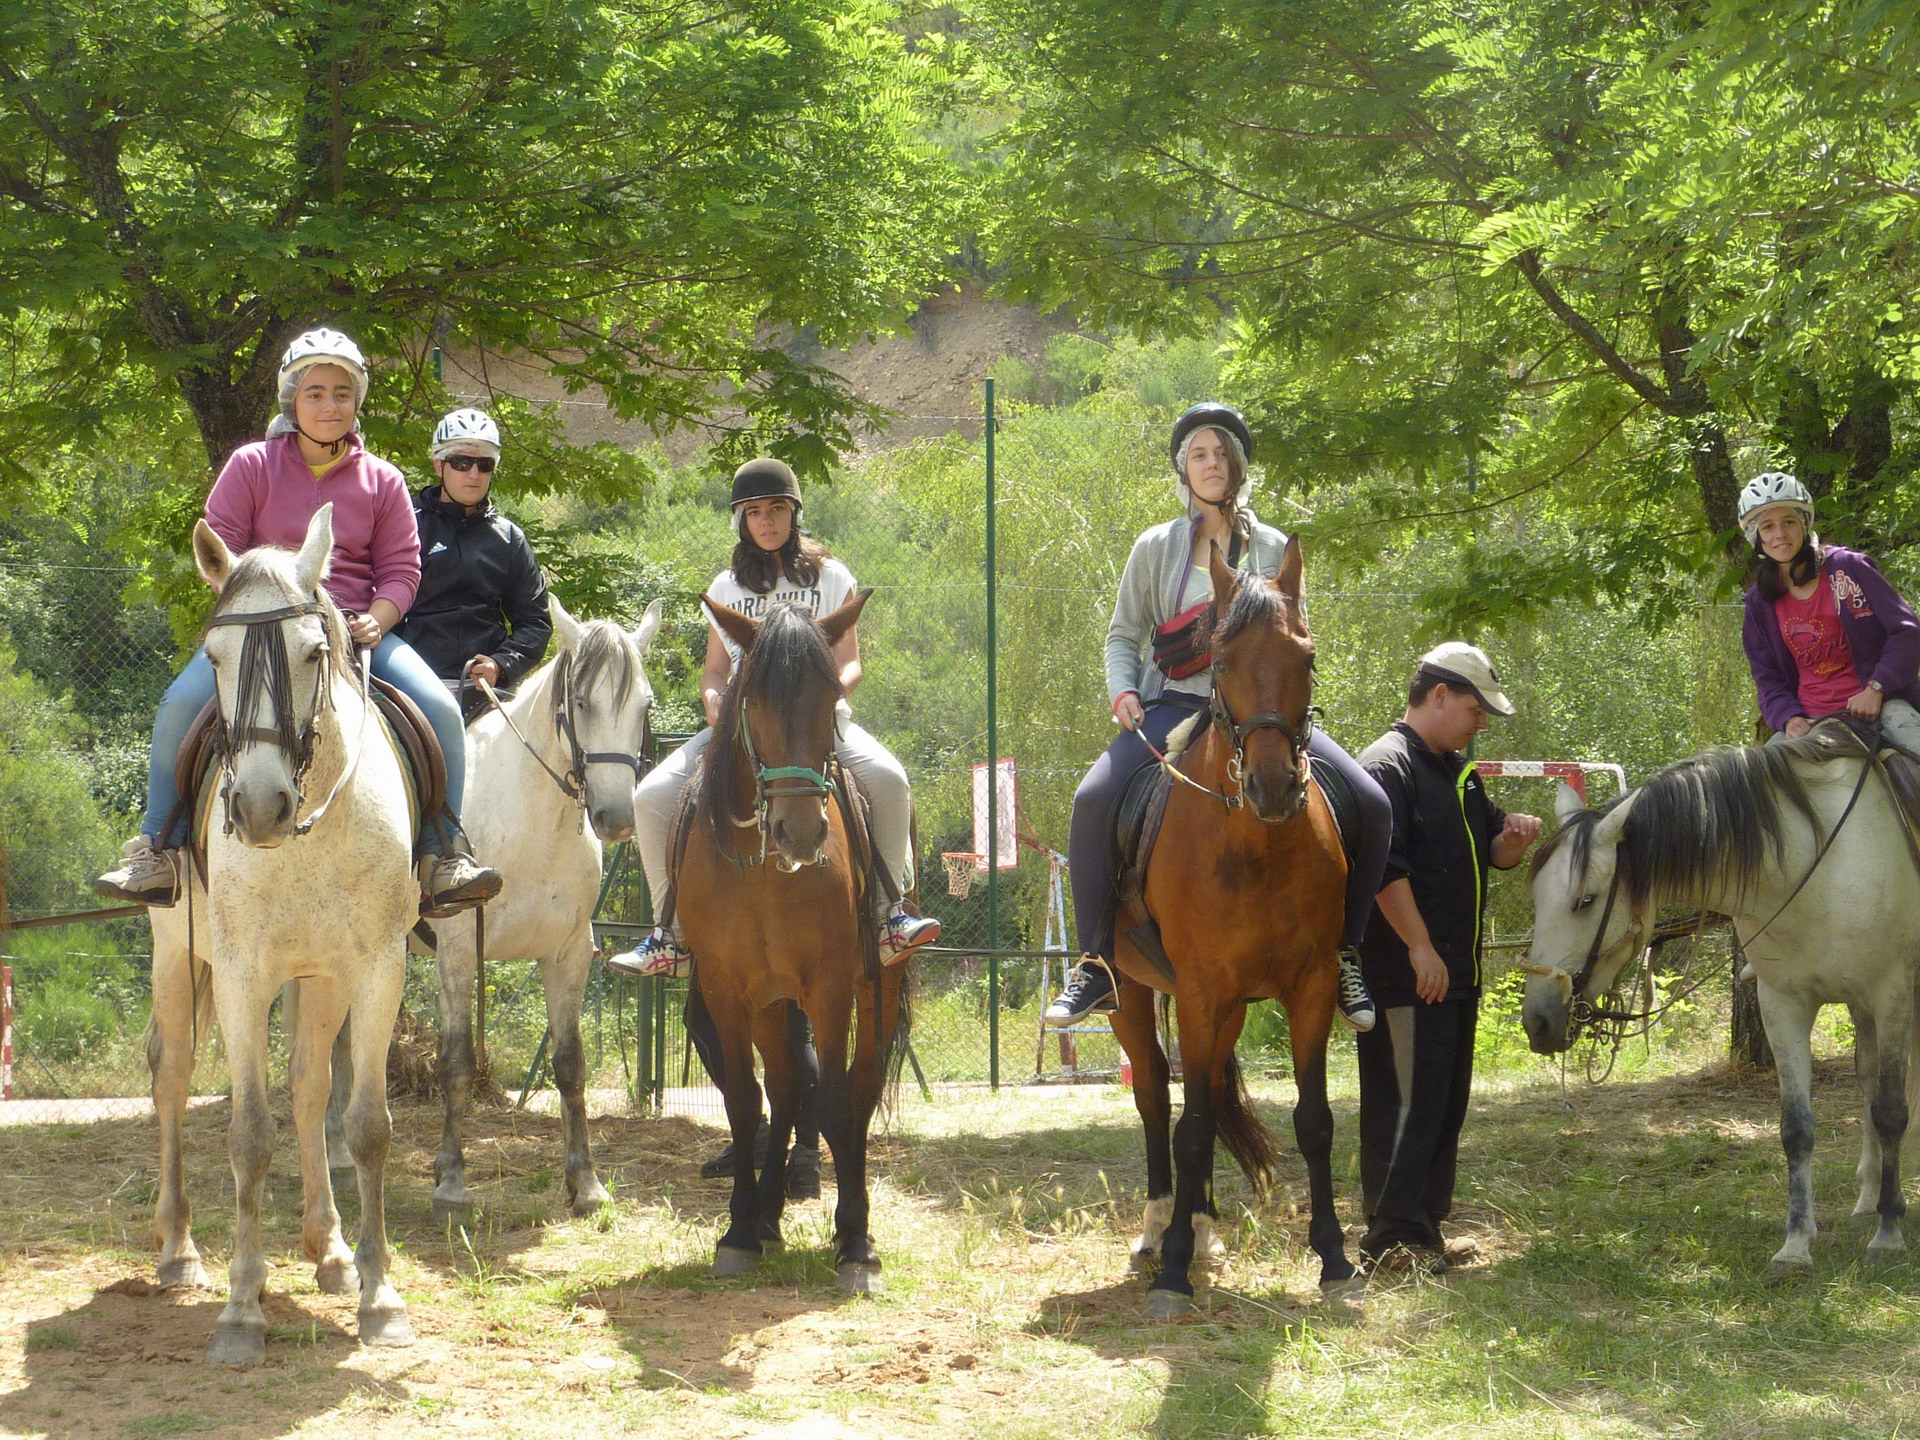 Campamentos de Verano en España para niños jóvenes adolescentes Multiaventura Ruta a Caballo